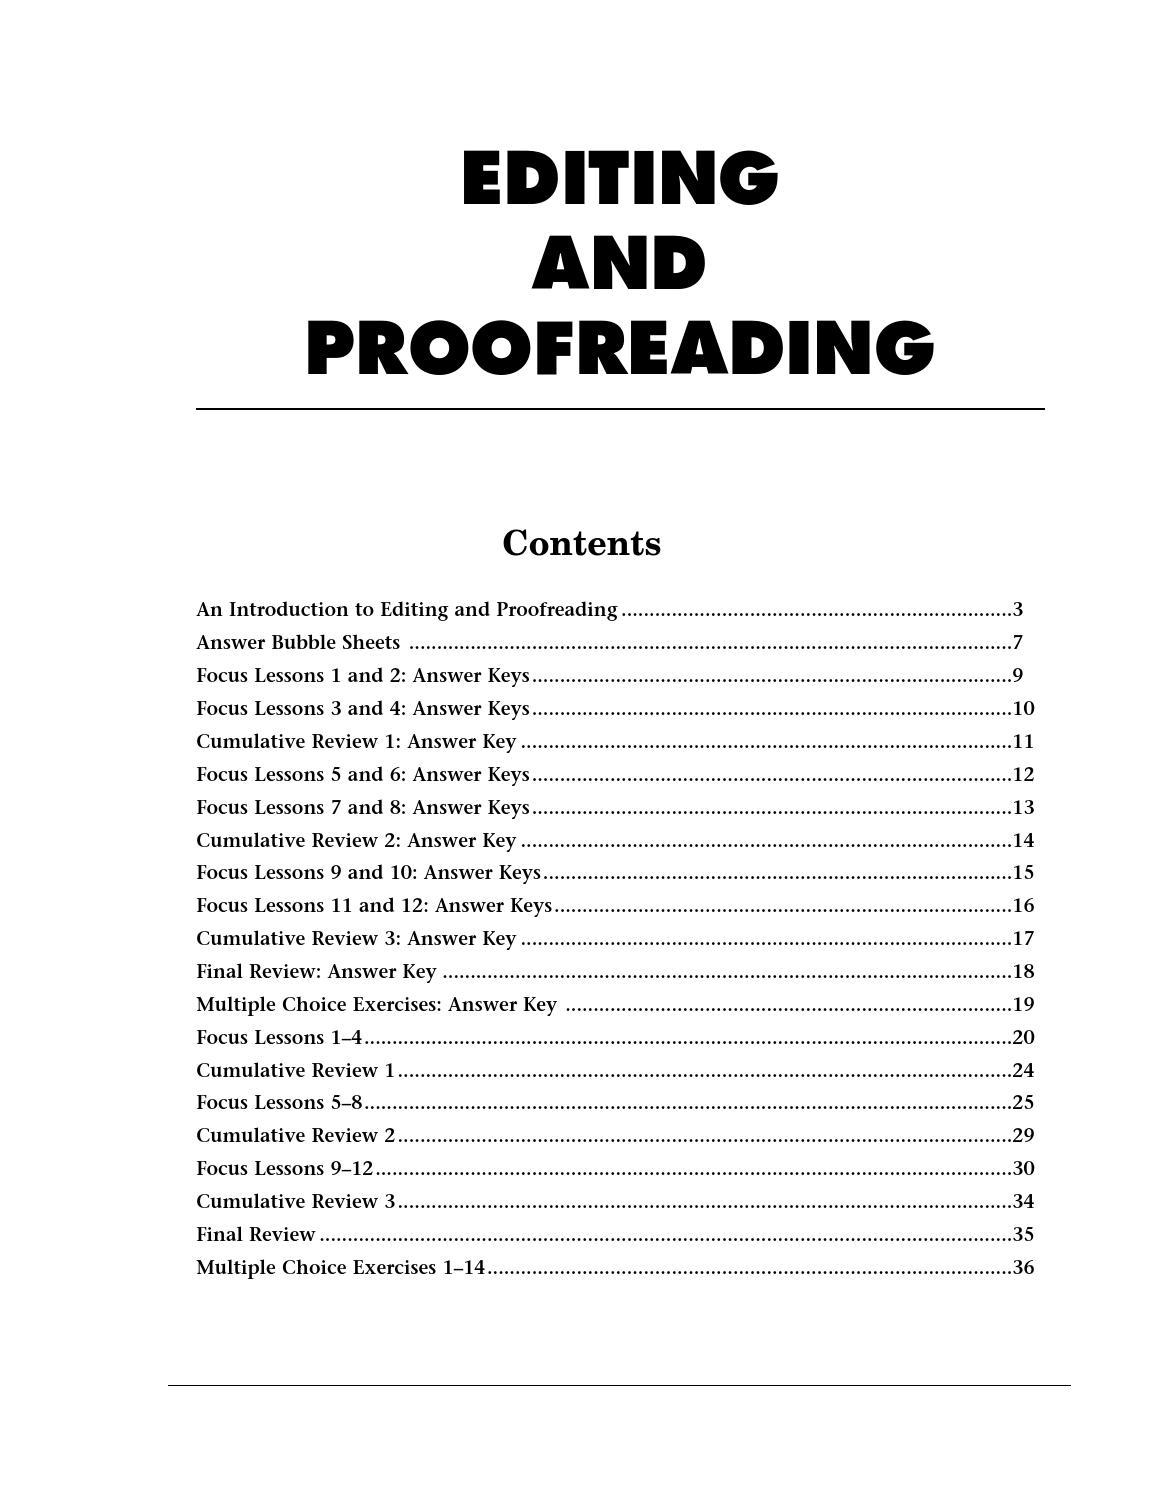 hight resolution of Glencoe proofreading by Belen Fagundez - issuu